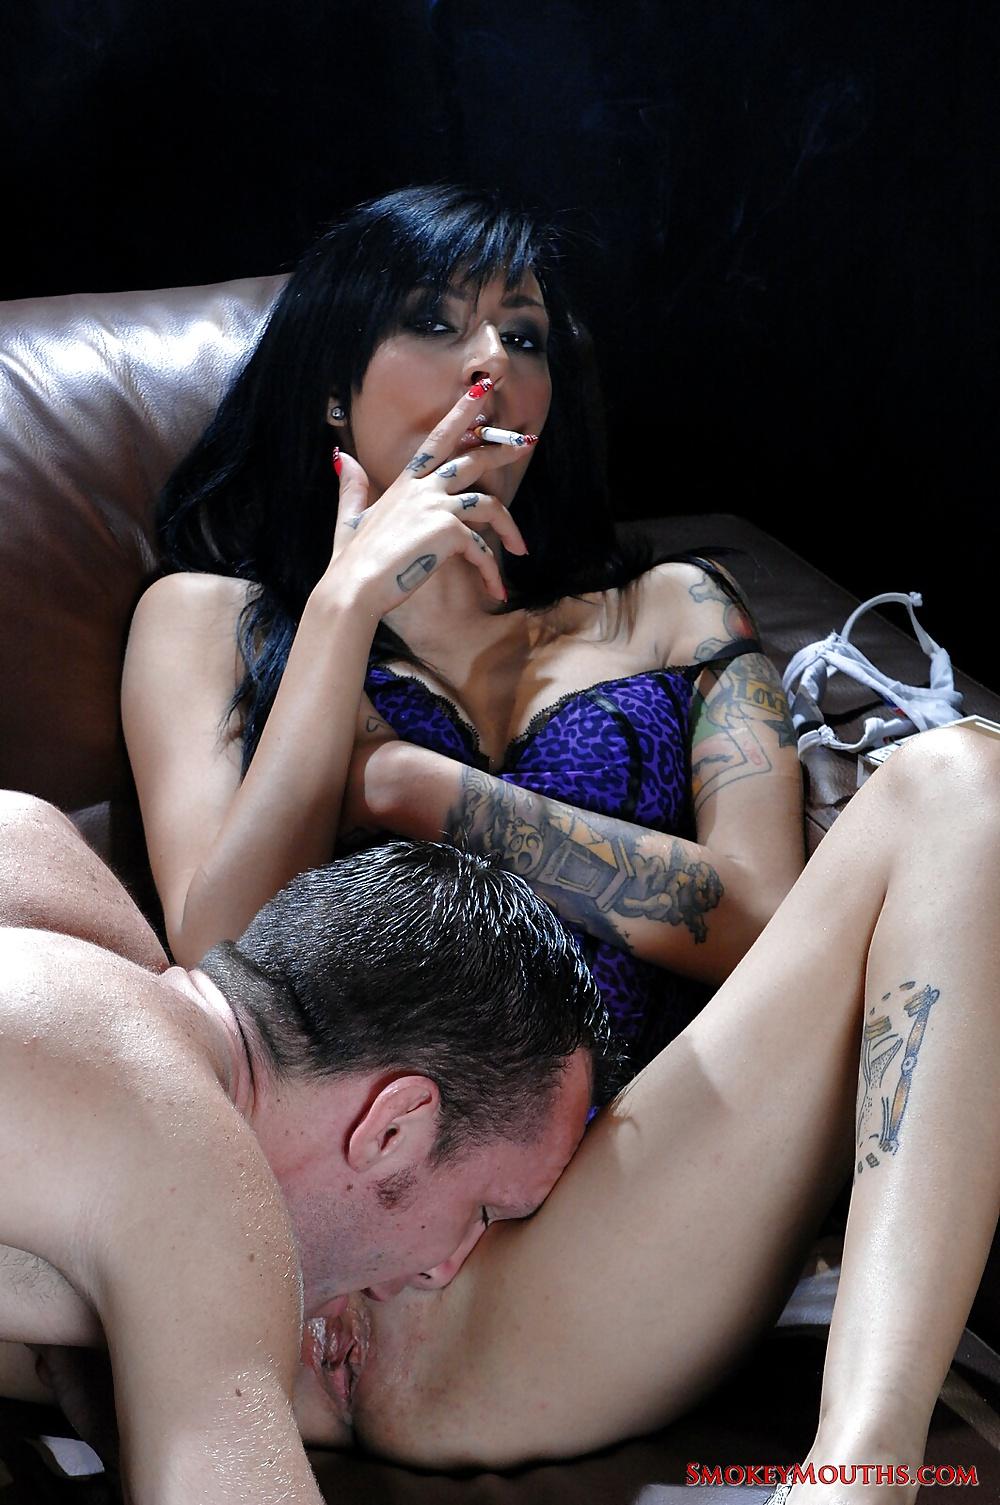 Порно шлюха курит #12